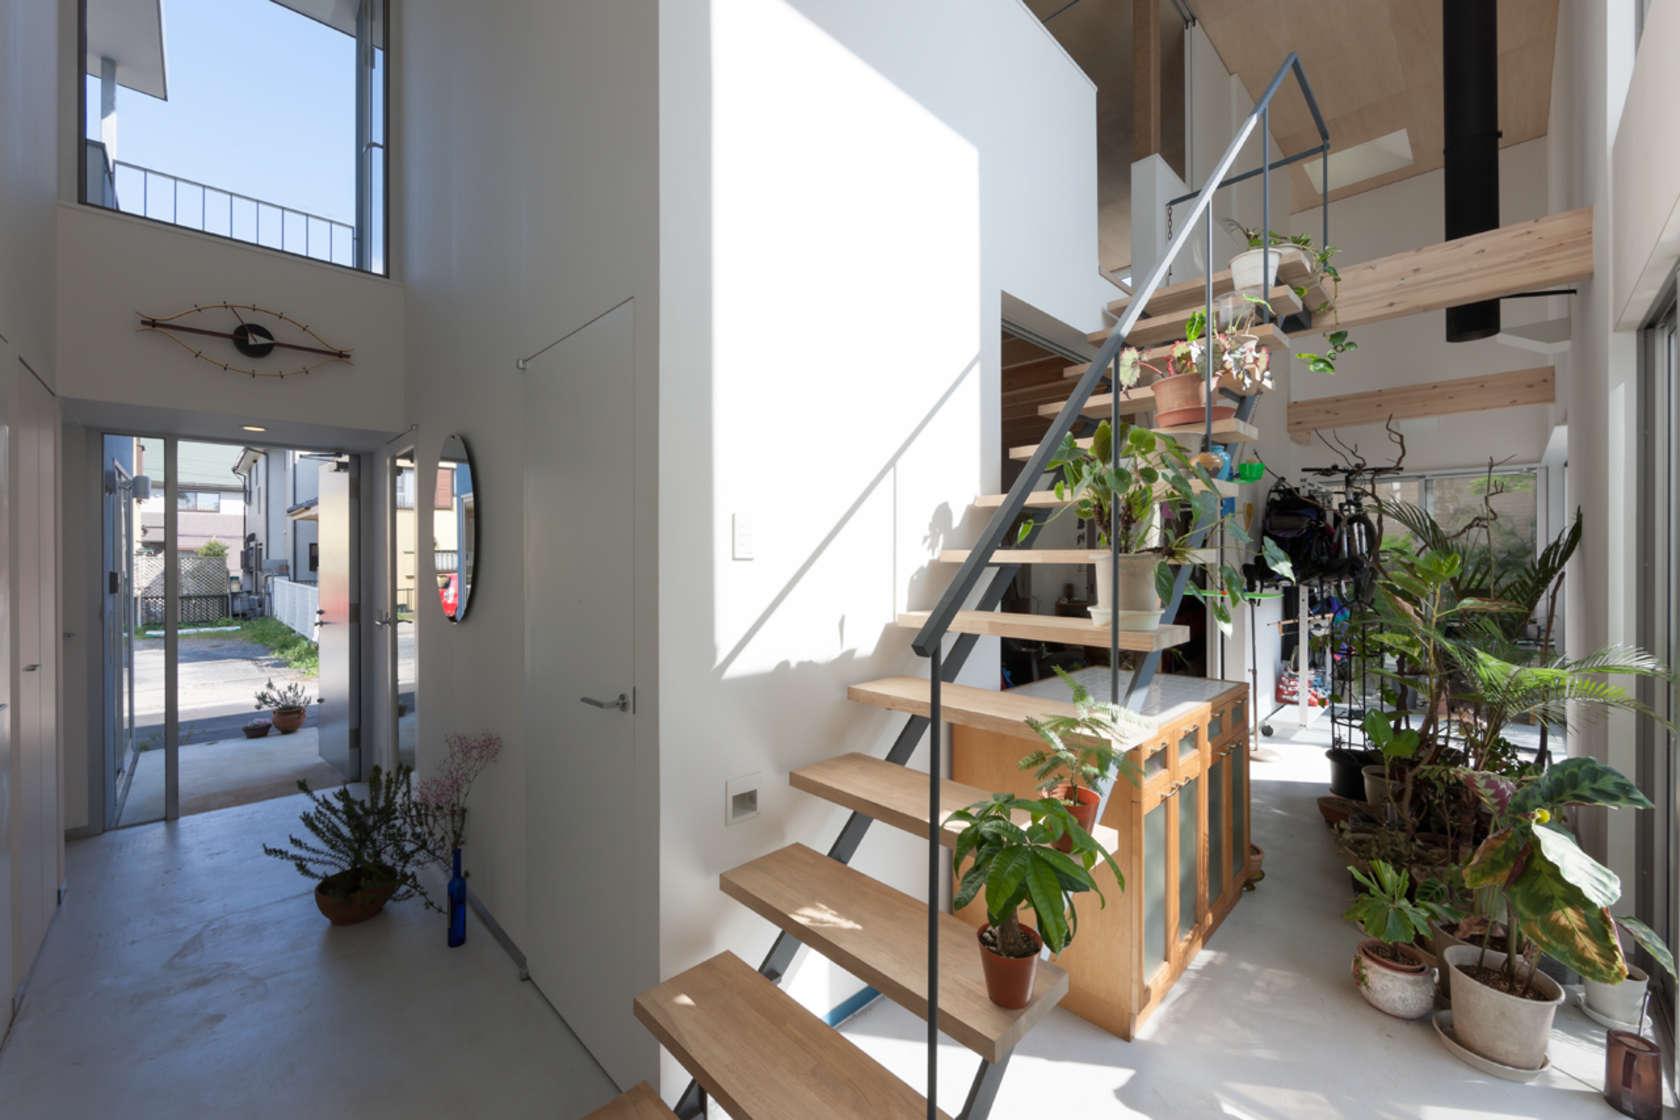 Sugawa lab architects architizer for Lab architects